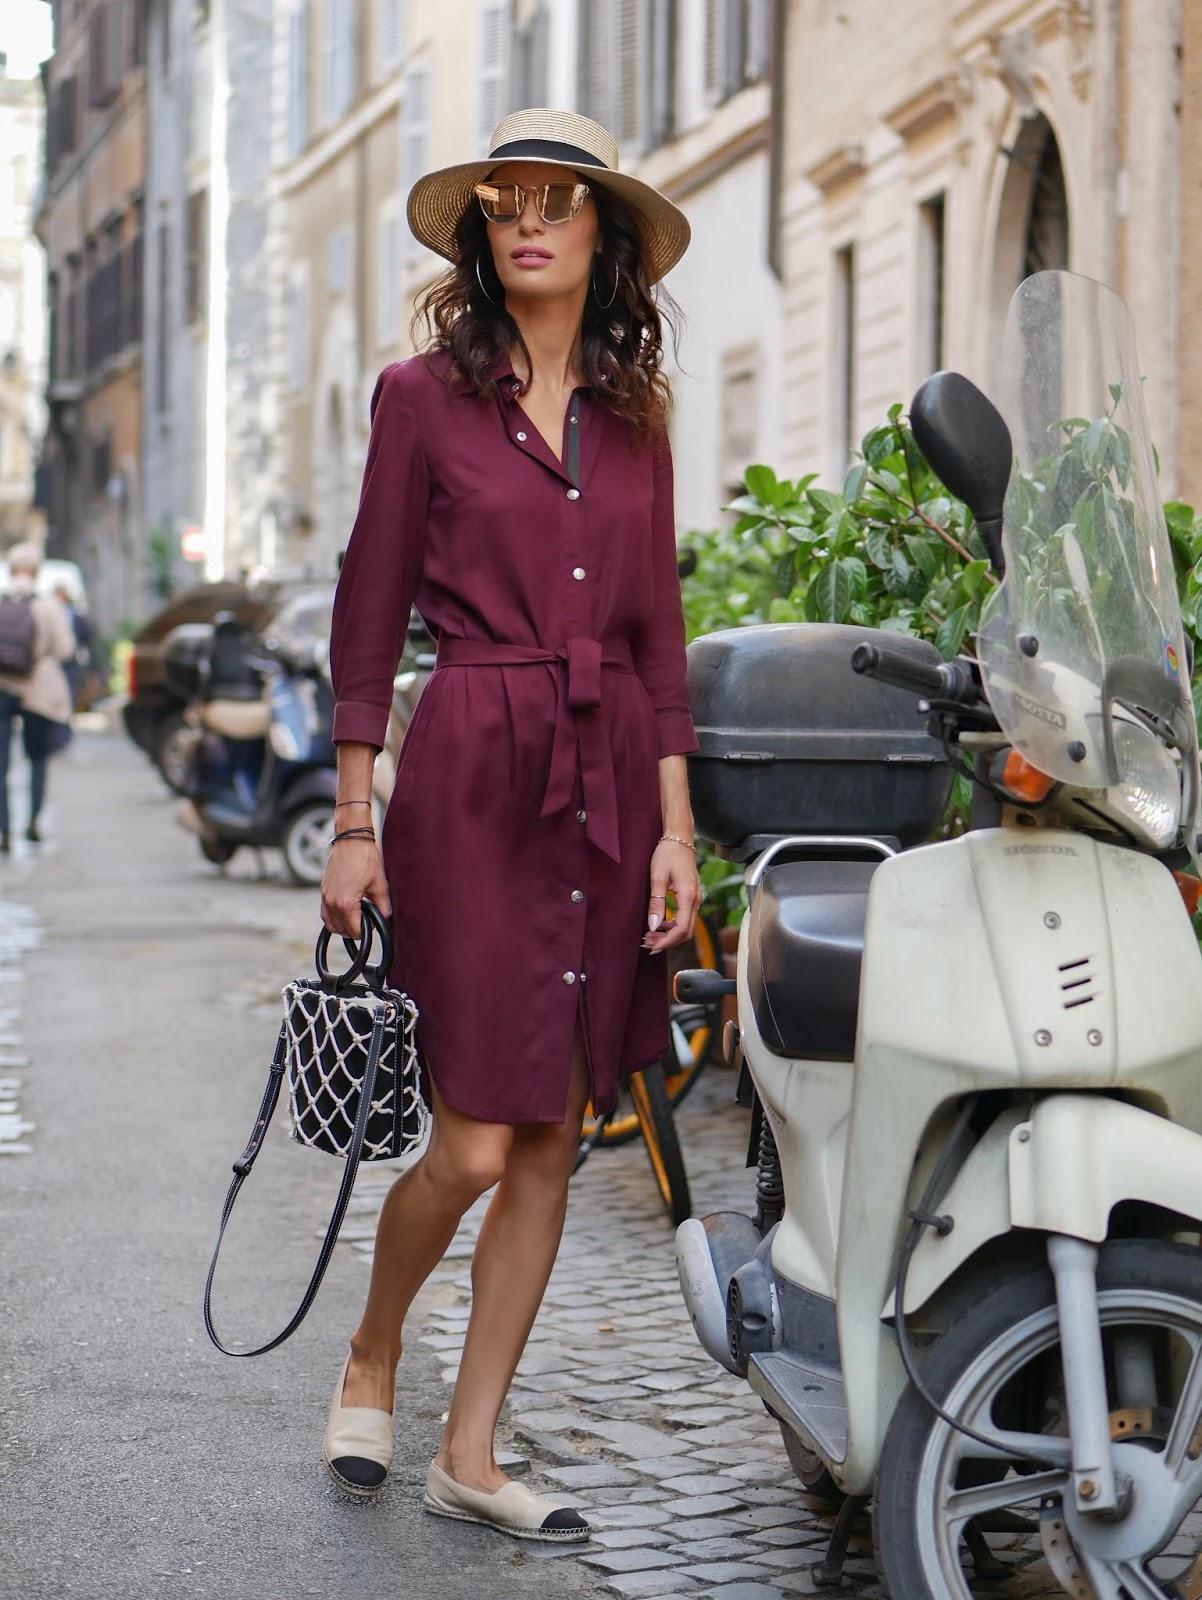 DEEP RED DRESS AS ITALIAN WINE